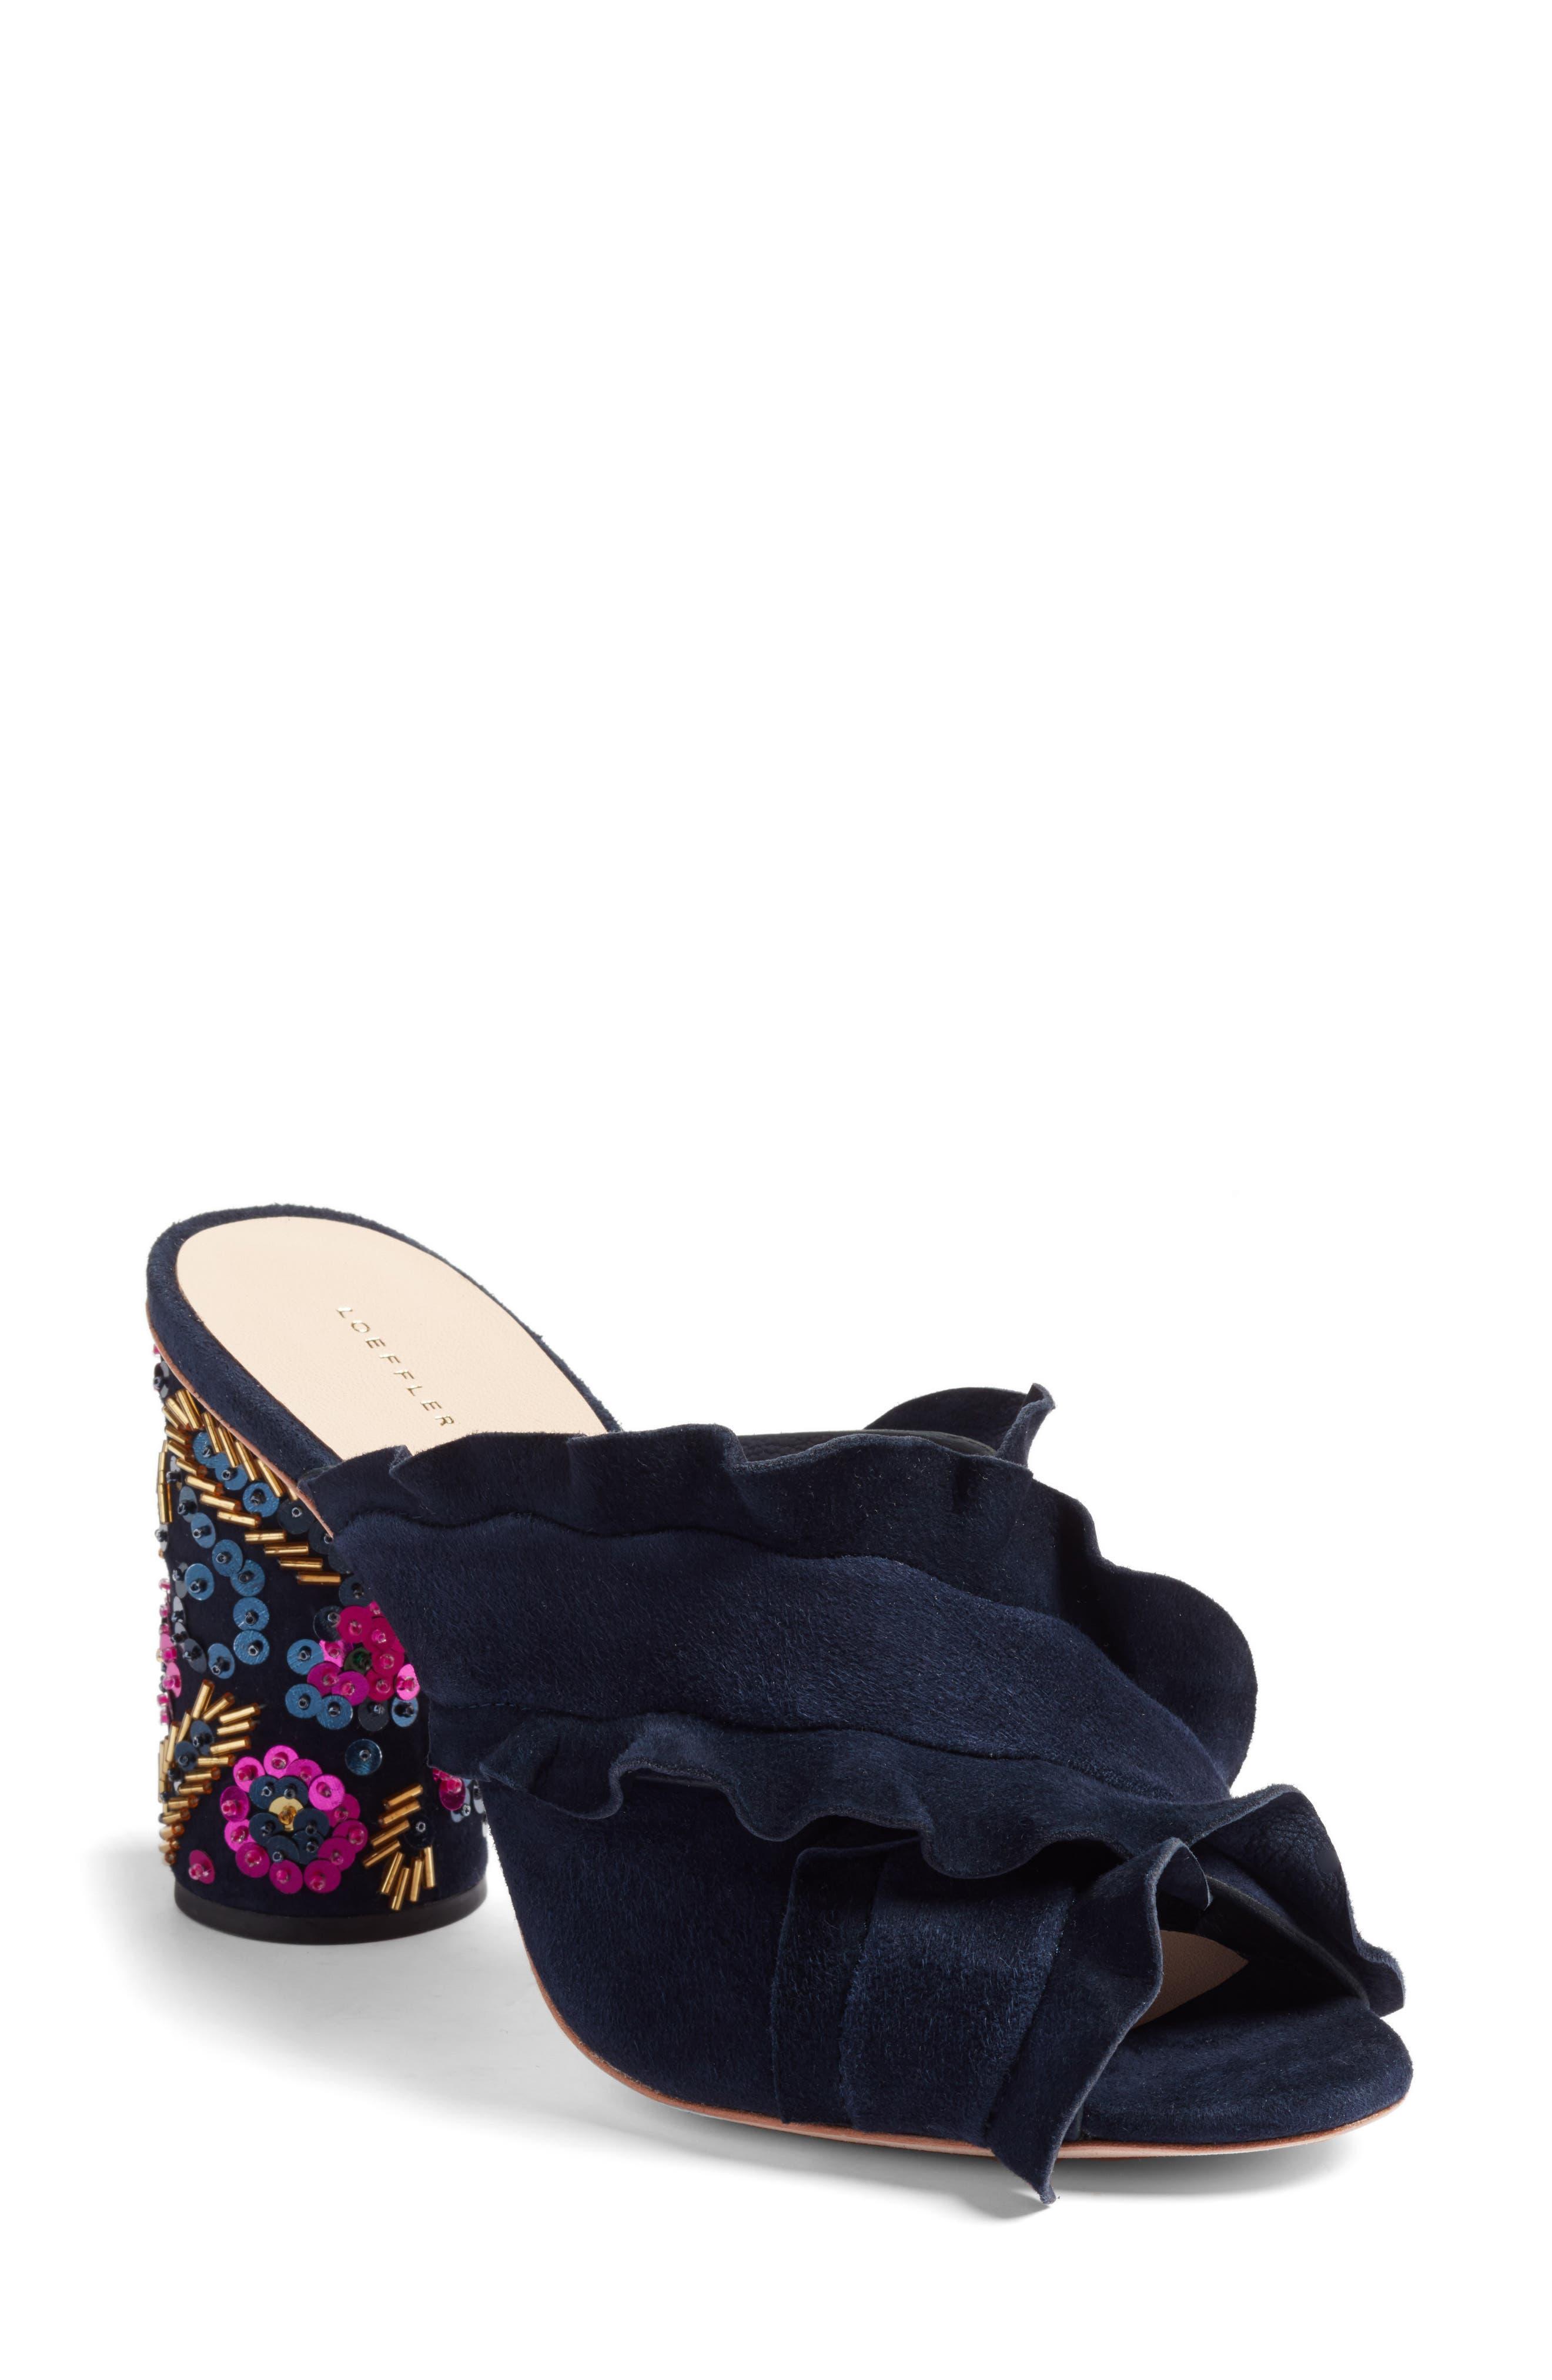 Kaya Embellished Ruffle Slide Sandal,                         Main,                         color, 499